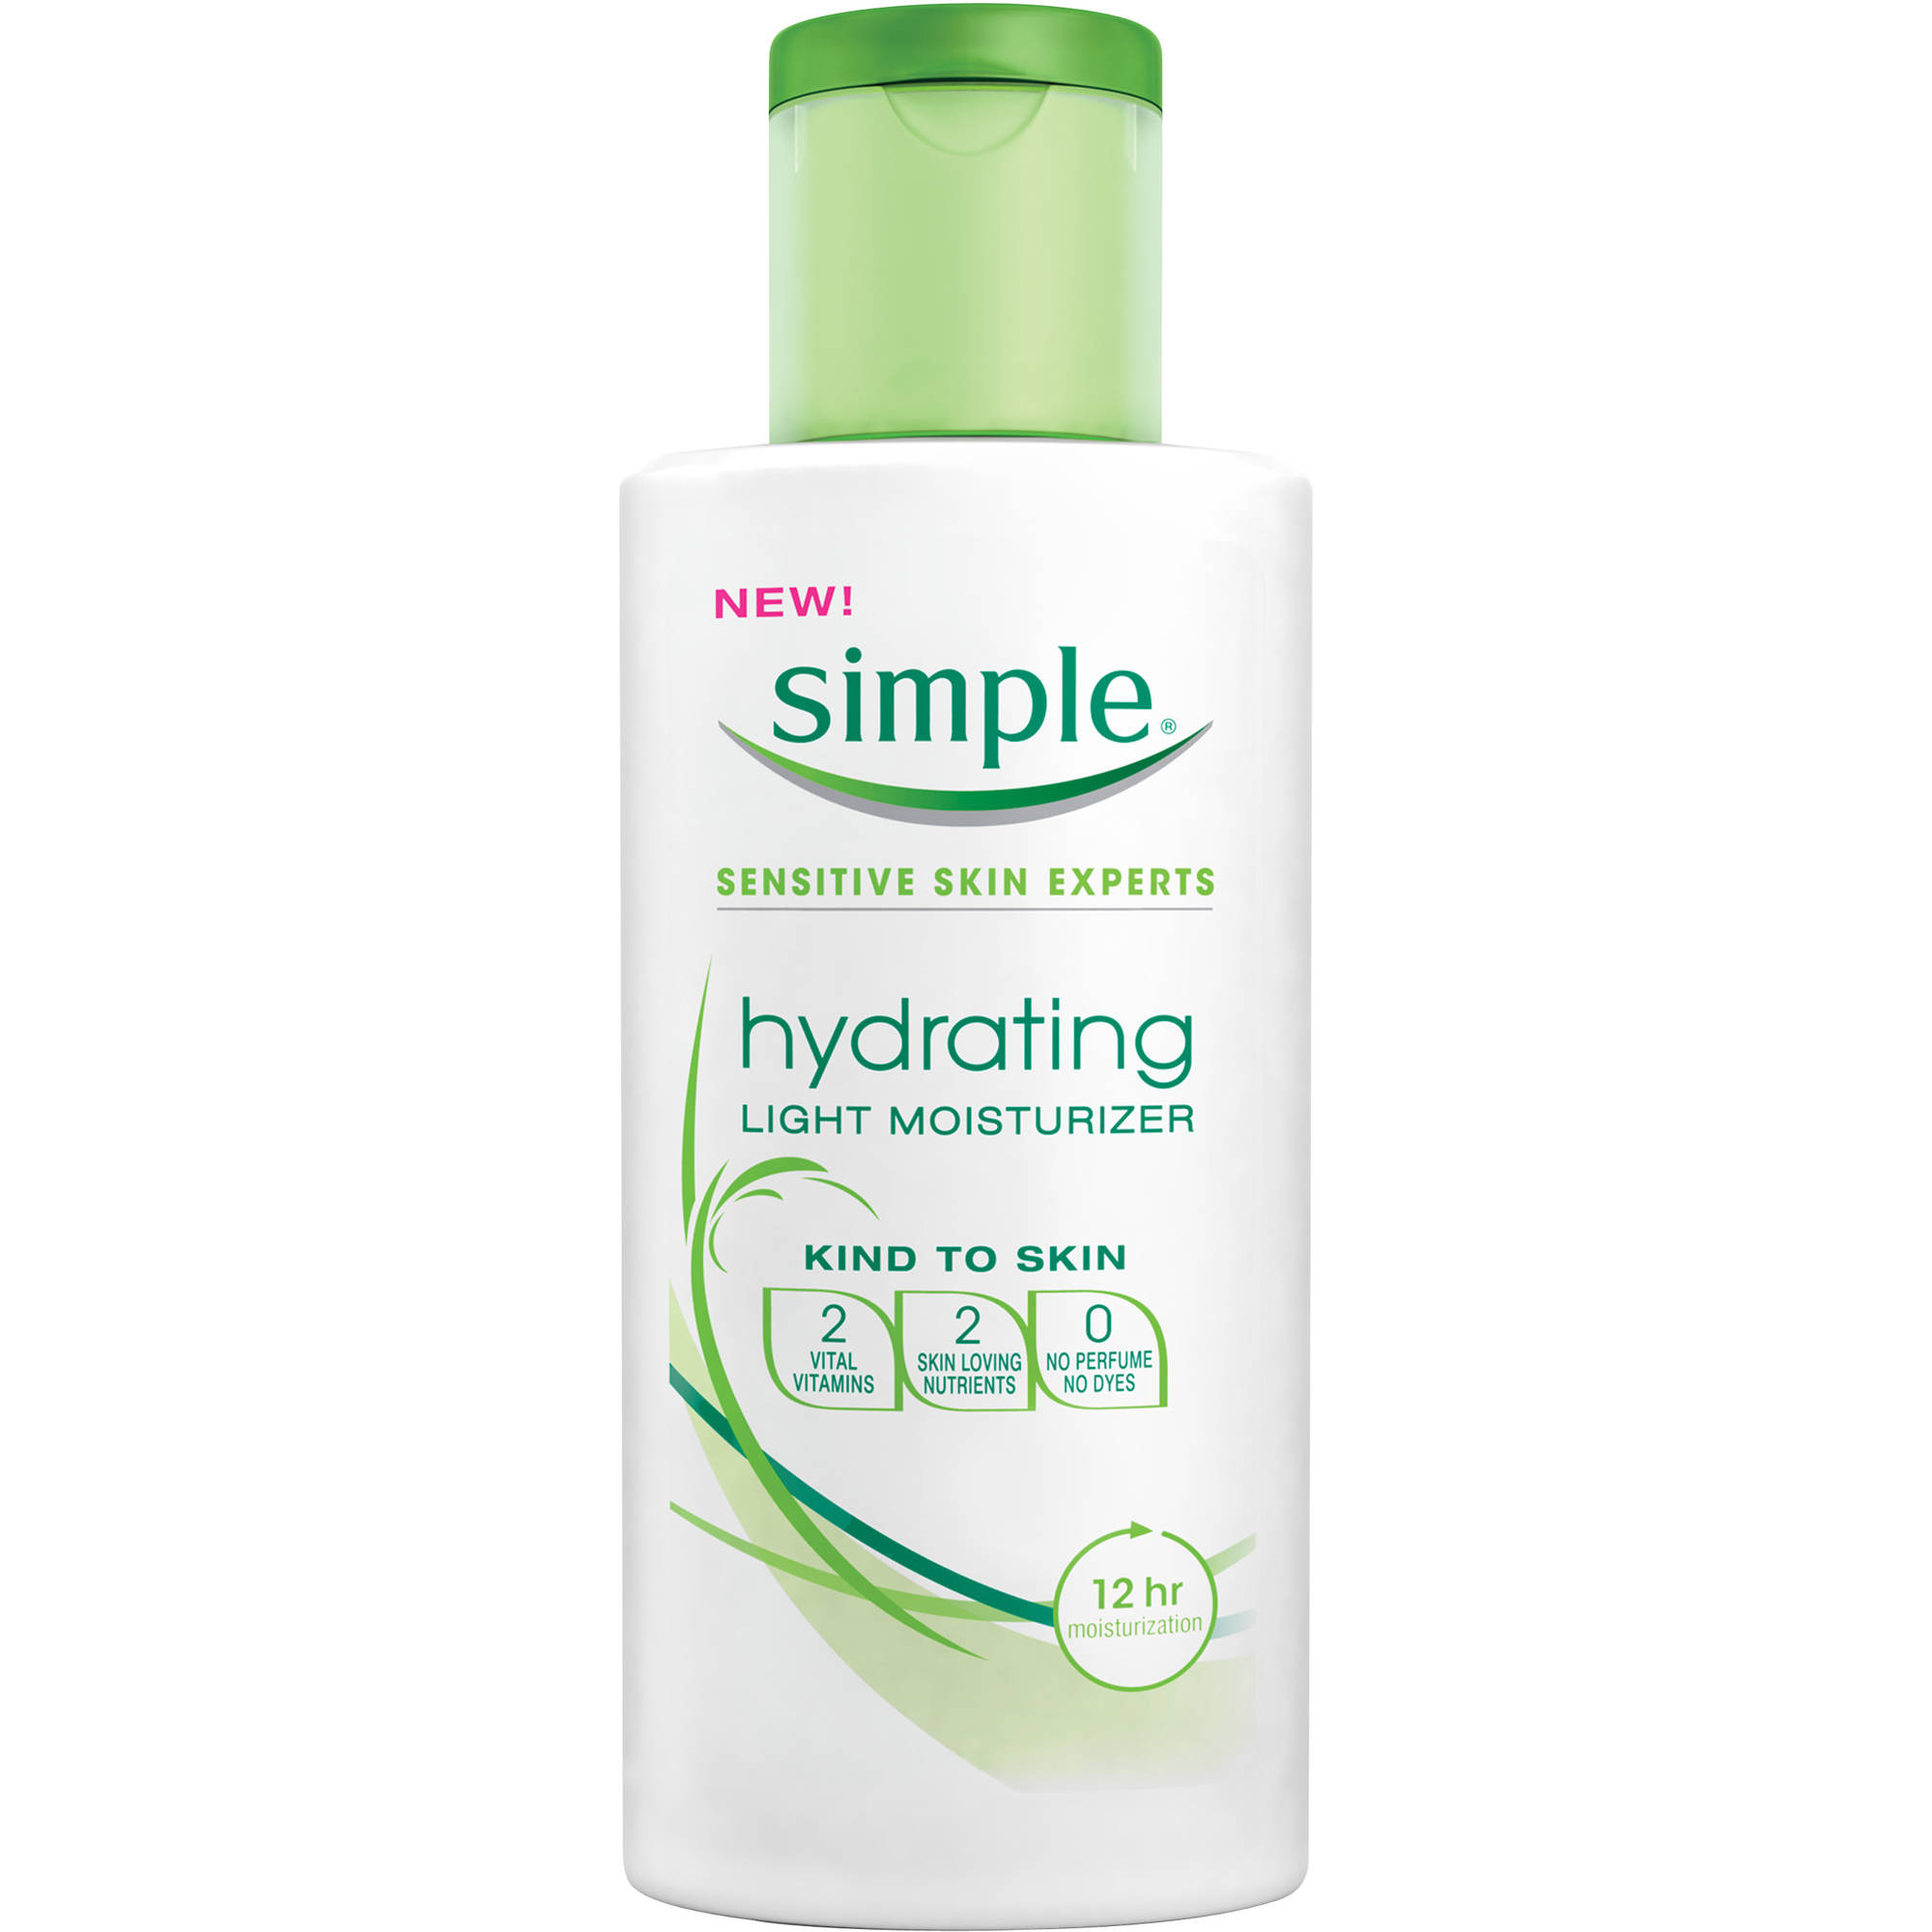 Simple Hydrating Light Moisturizer, 4.2 oz